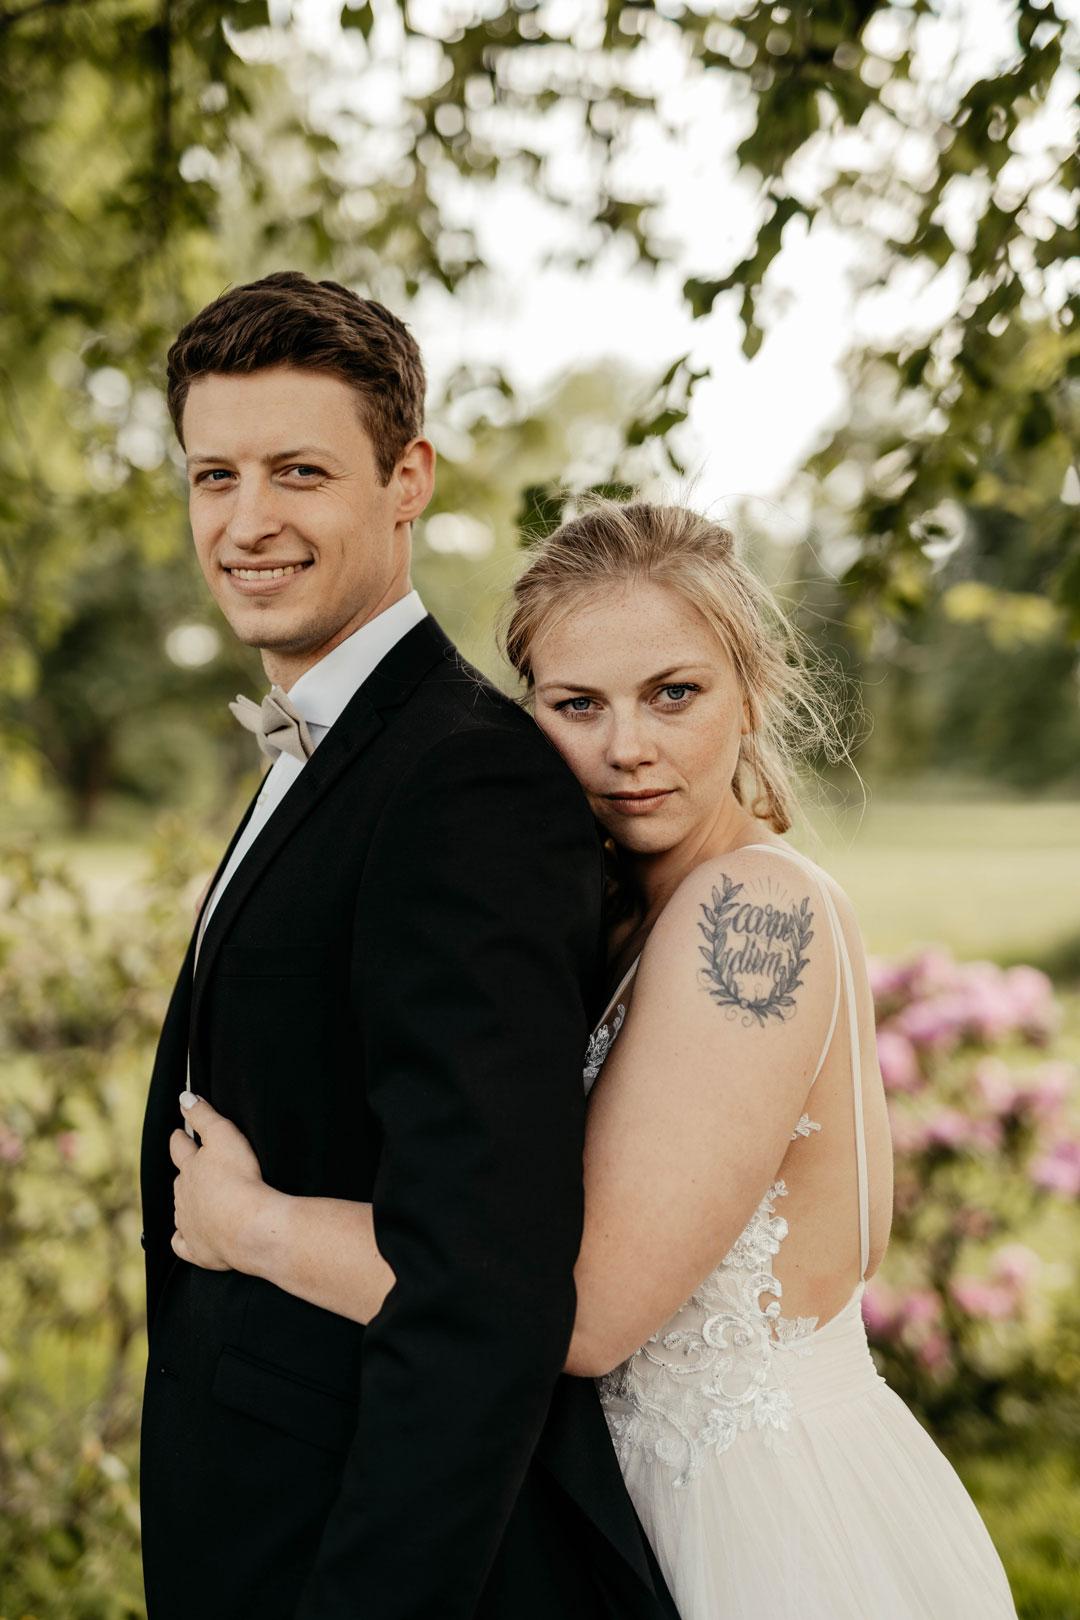 Brautpaar fotografie Schloss Myllendonk